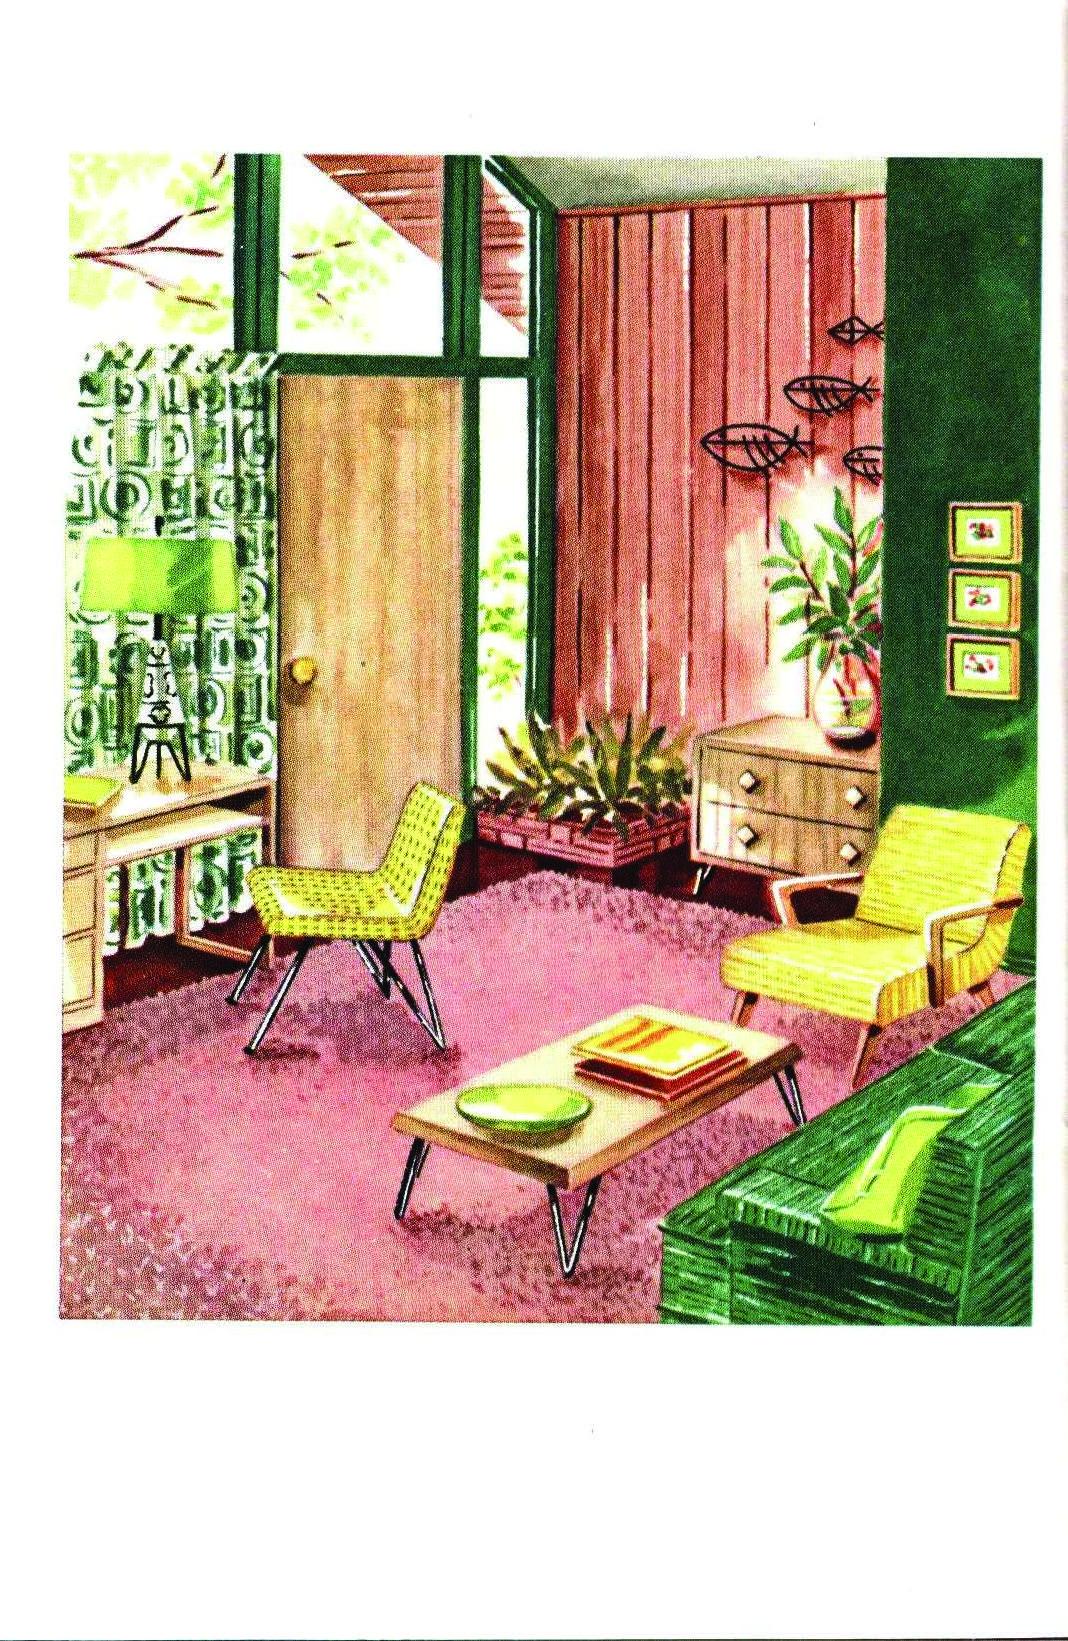 Sears Harmony House colors